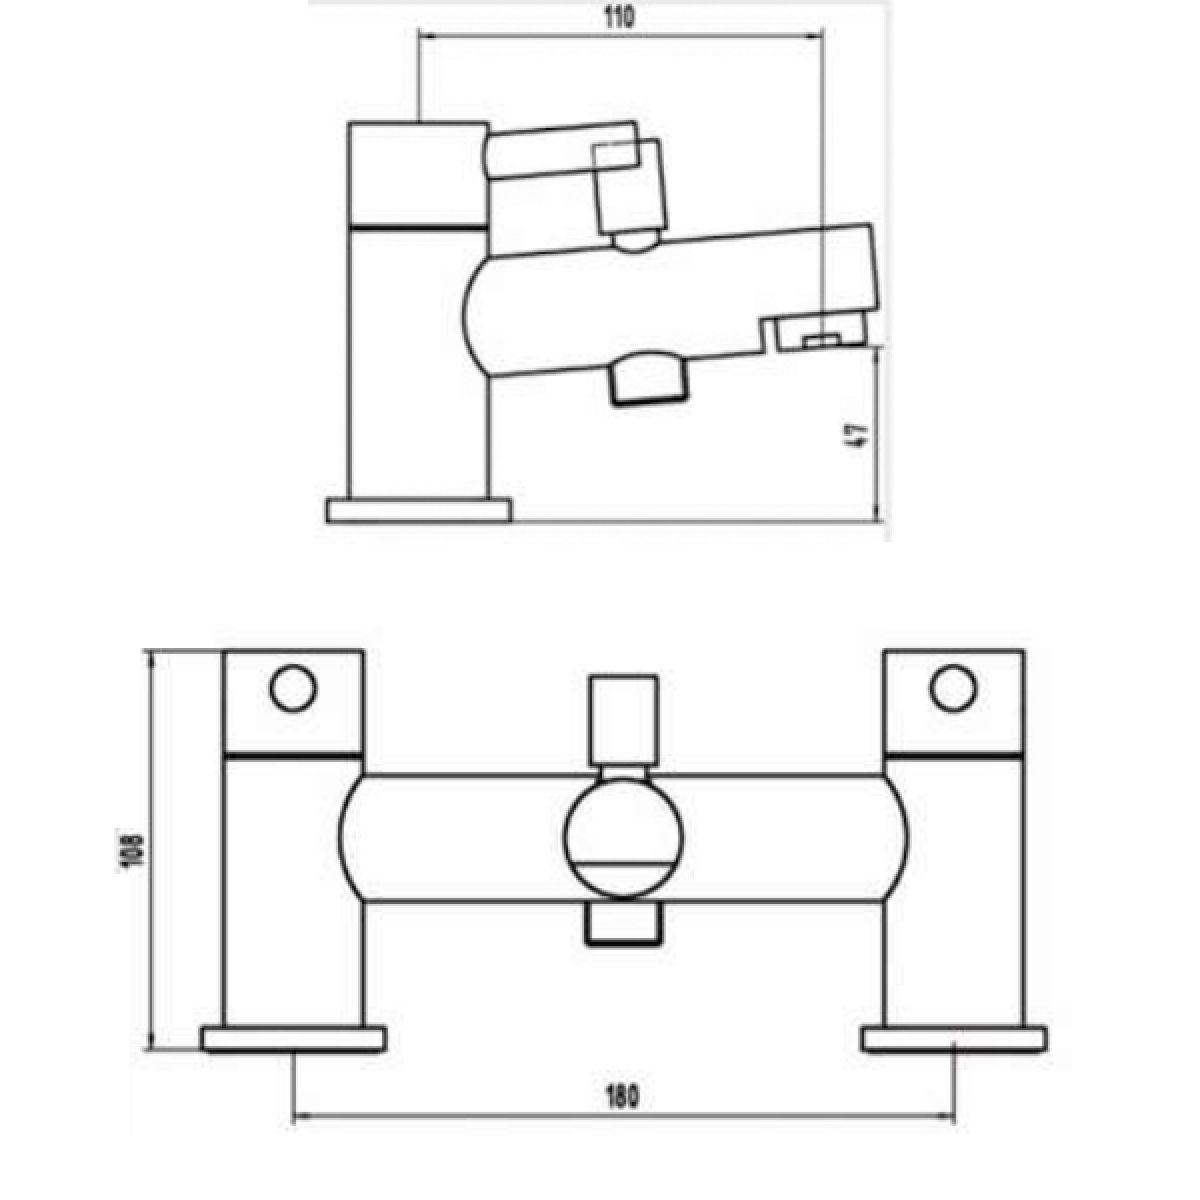 RAK Prima Deck Mounted Shower Bath Mixer Tap Measurements